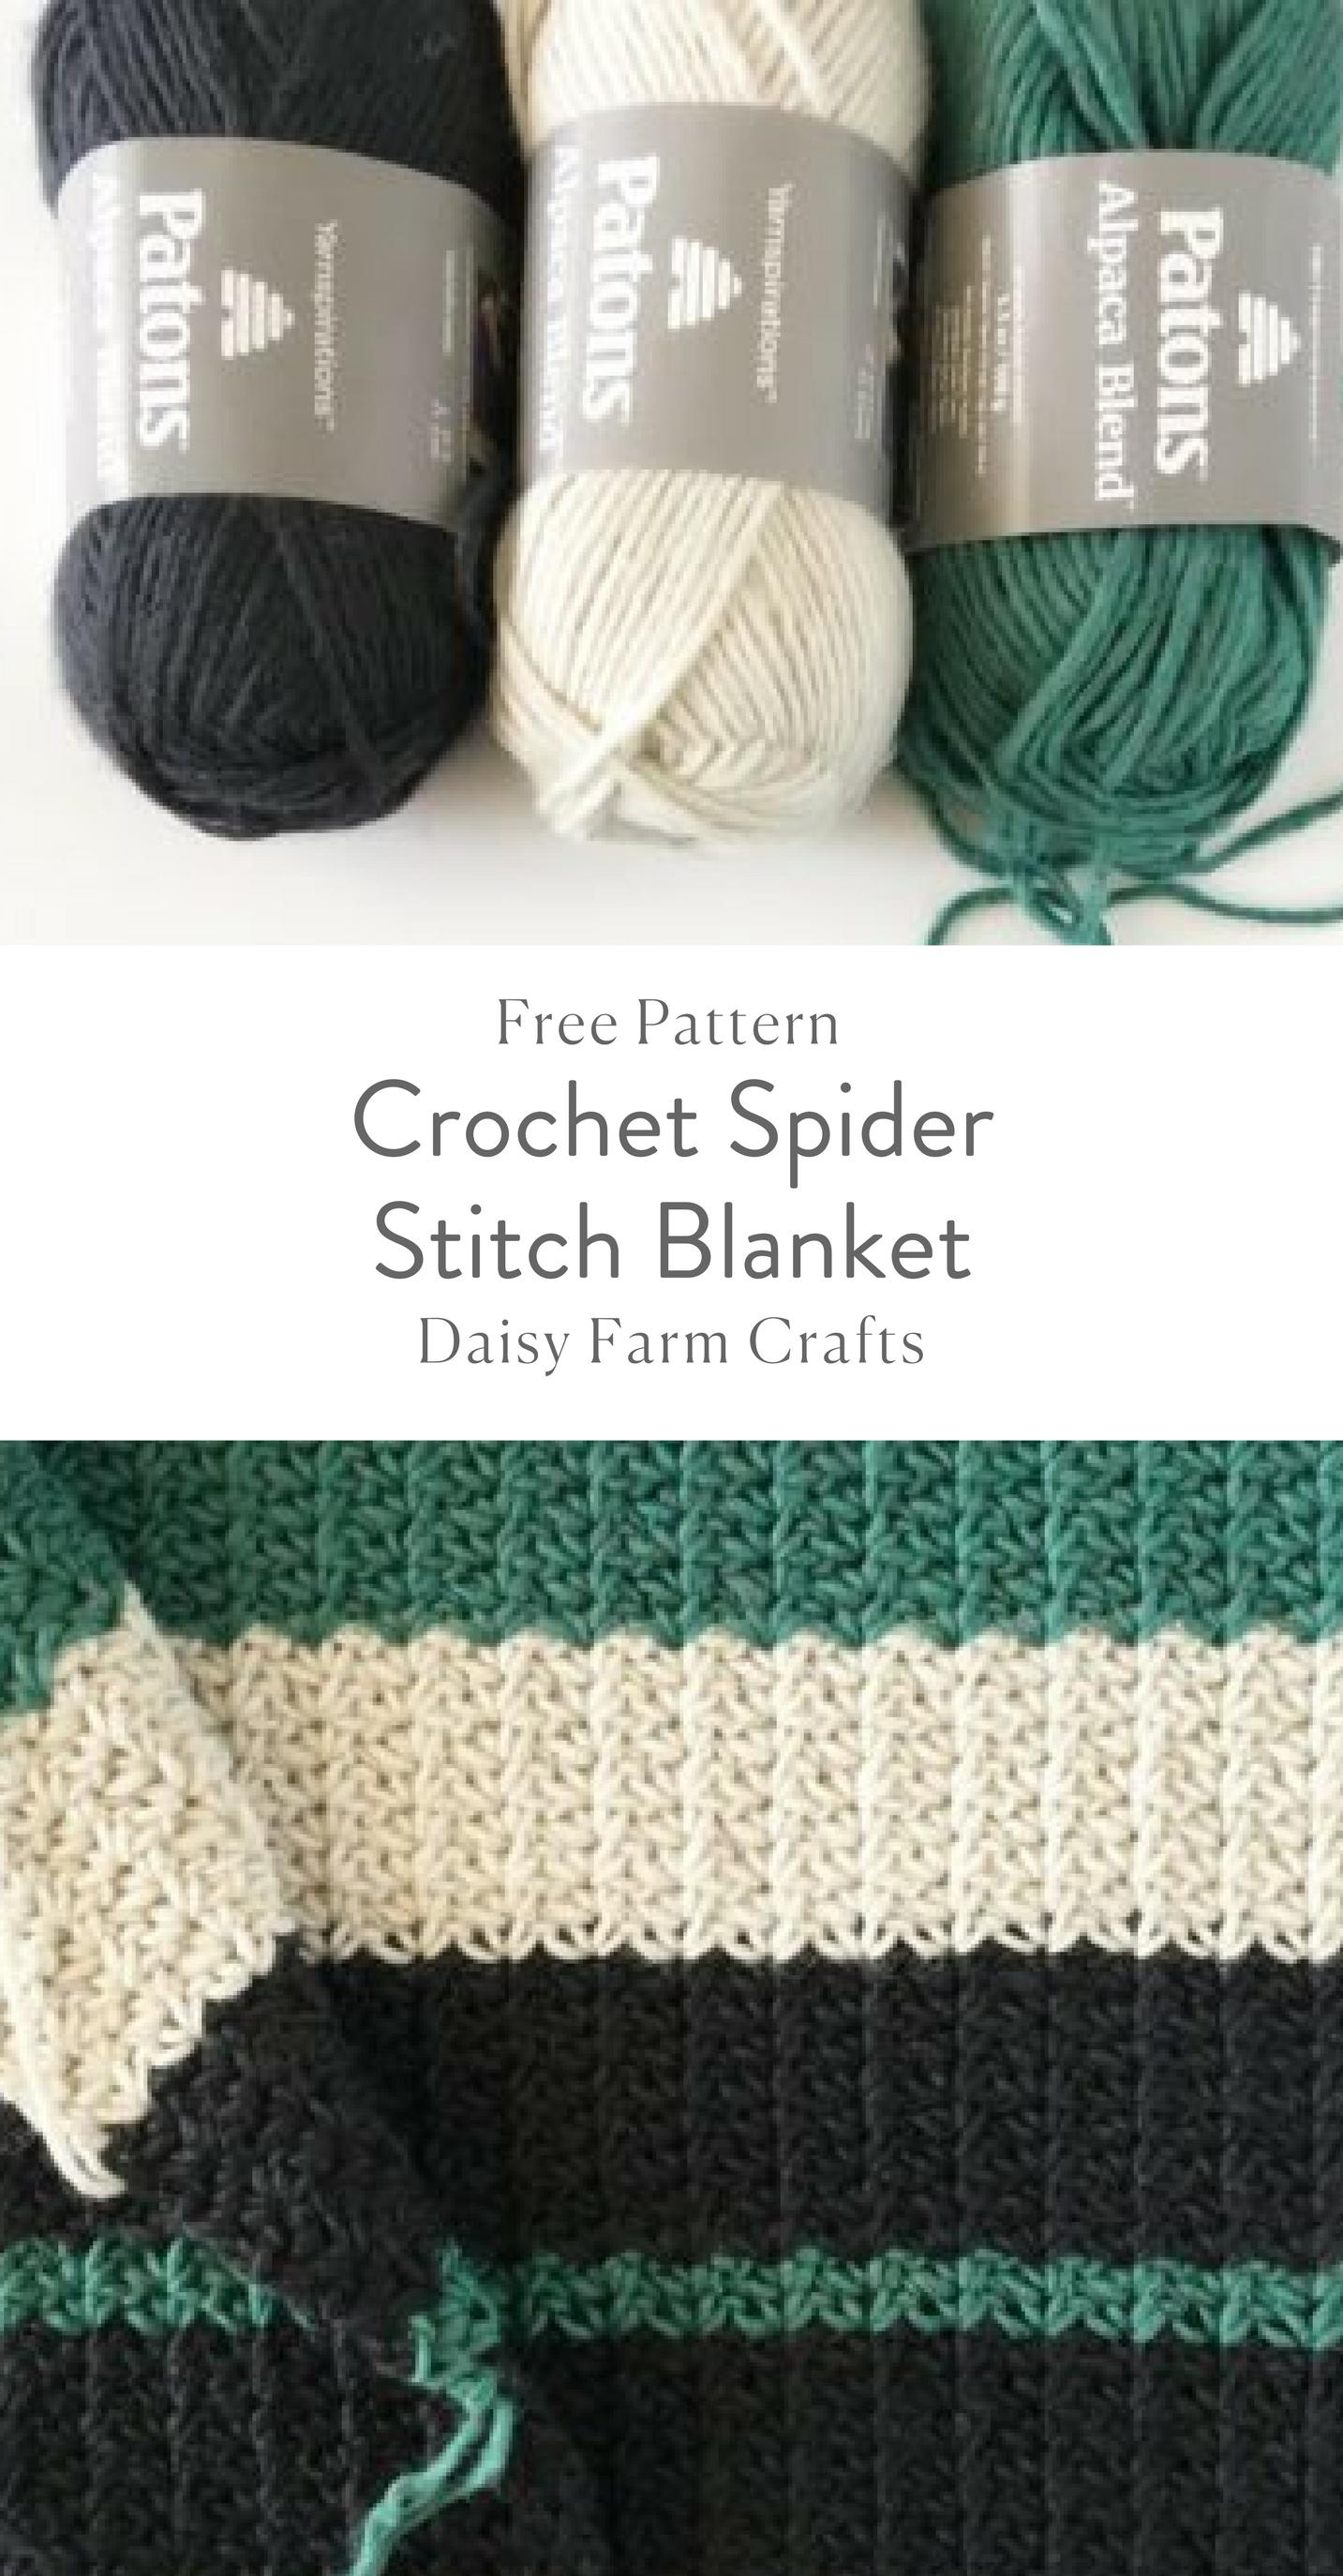 Free Pattern - Crochet Spider Stitch Blanket #CrochetAfghan ...